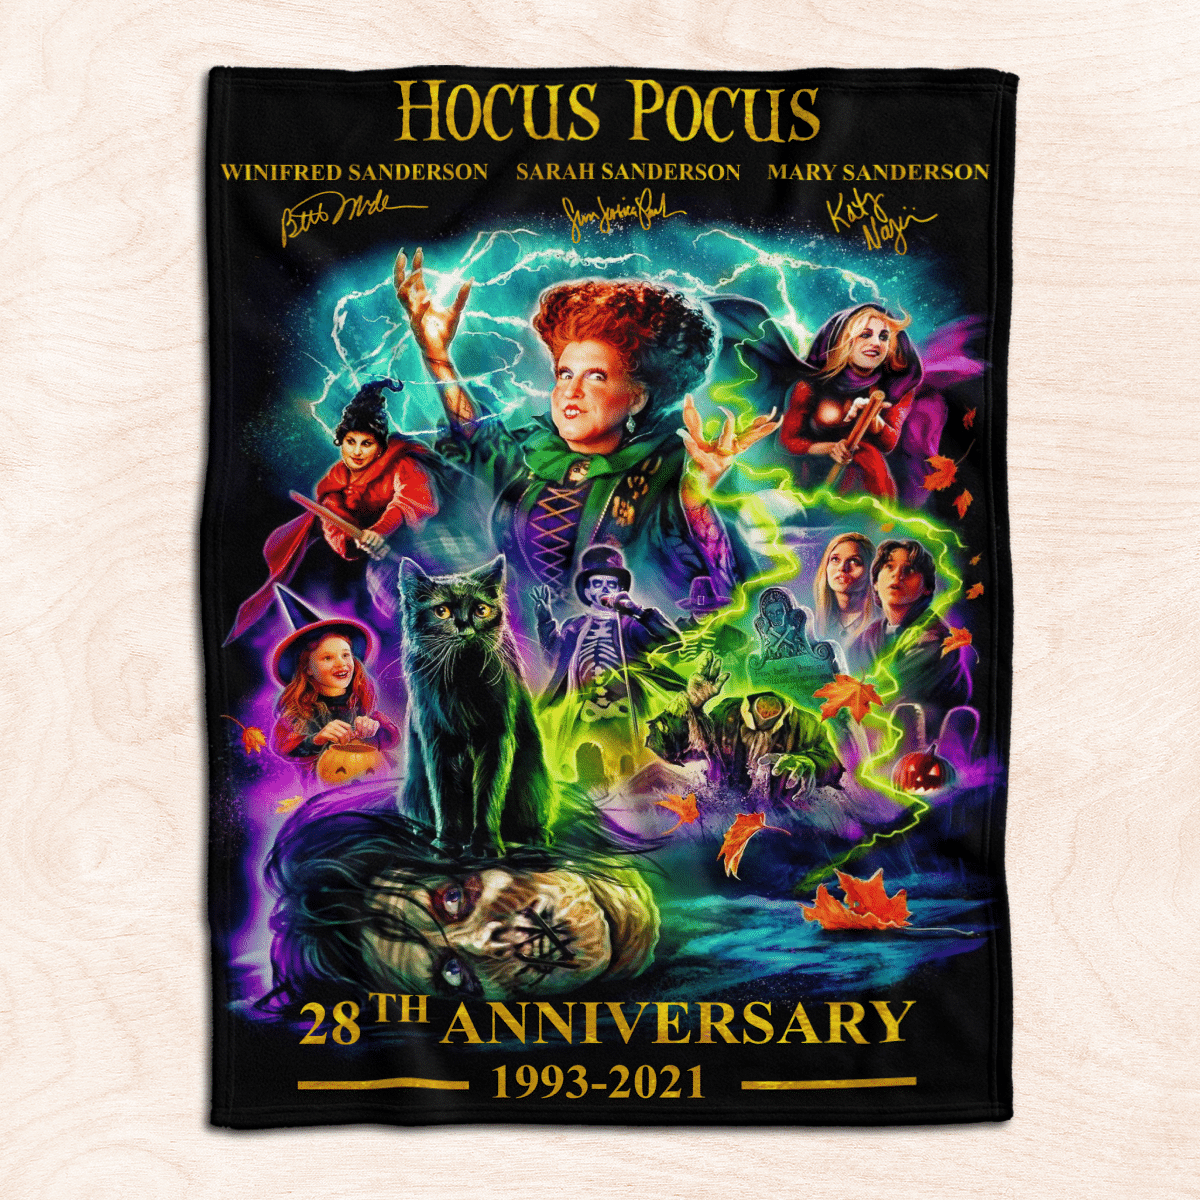 Hocus Pocus 28th Anniversary Premium Fleece Blanket